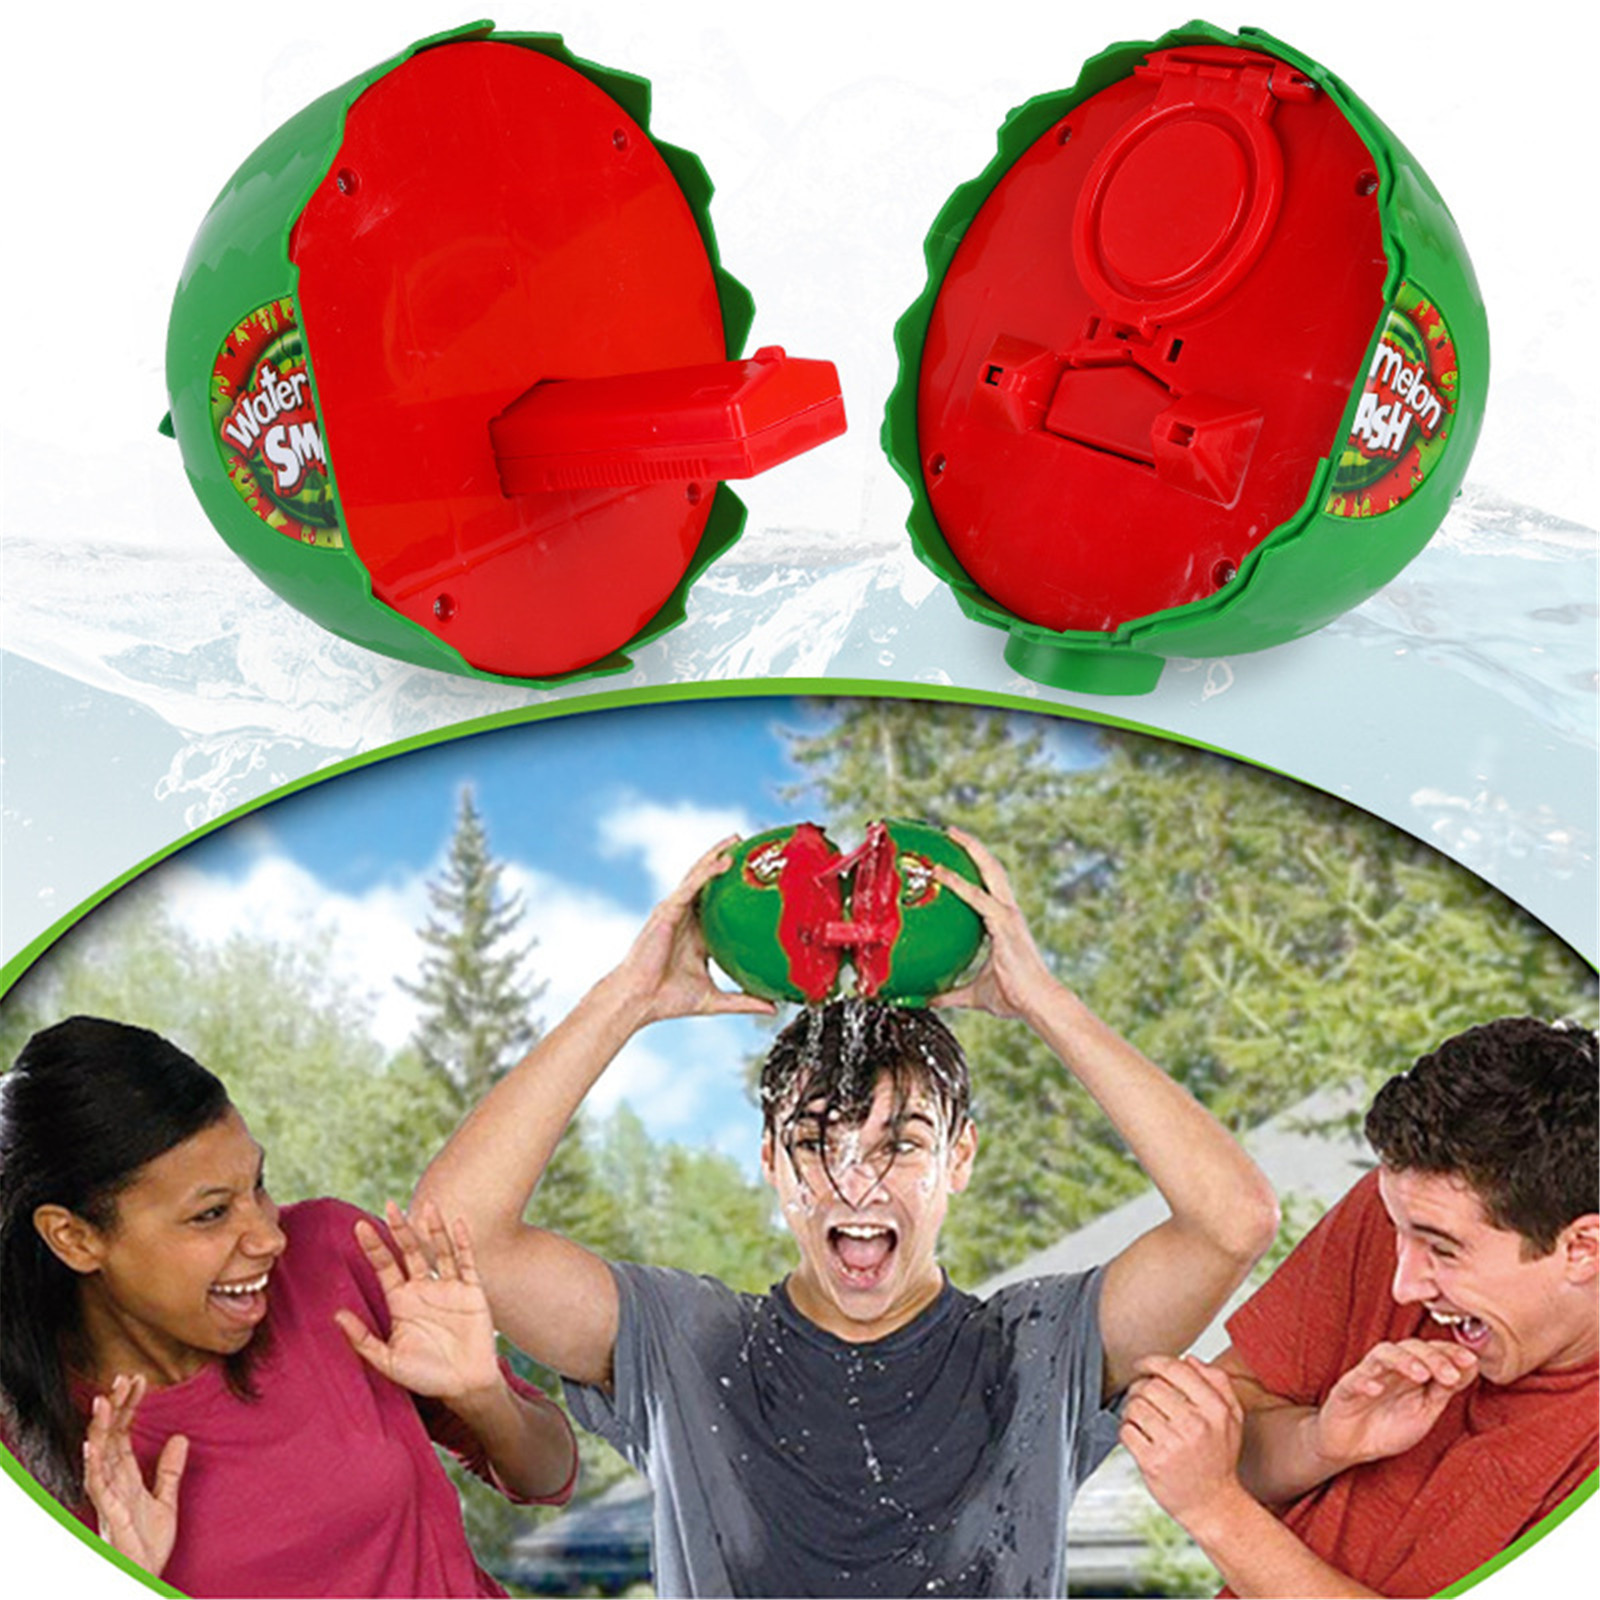 Watermelon Suspenseful Game Toys Watermelon Cracks Prank Antistress Fidget Toy Funny Jokes Children's Toy Guesswrong Leaking